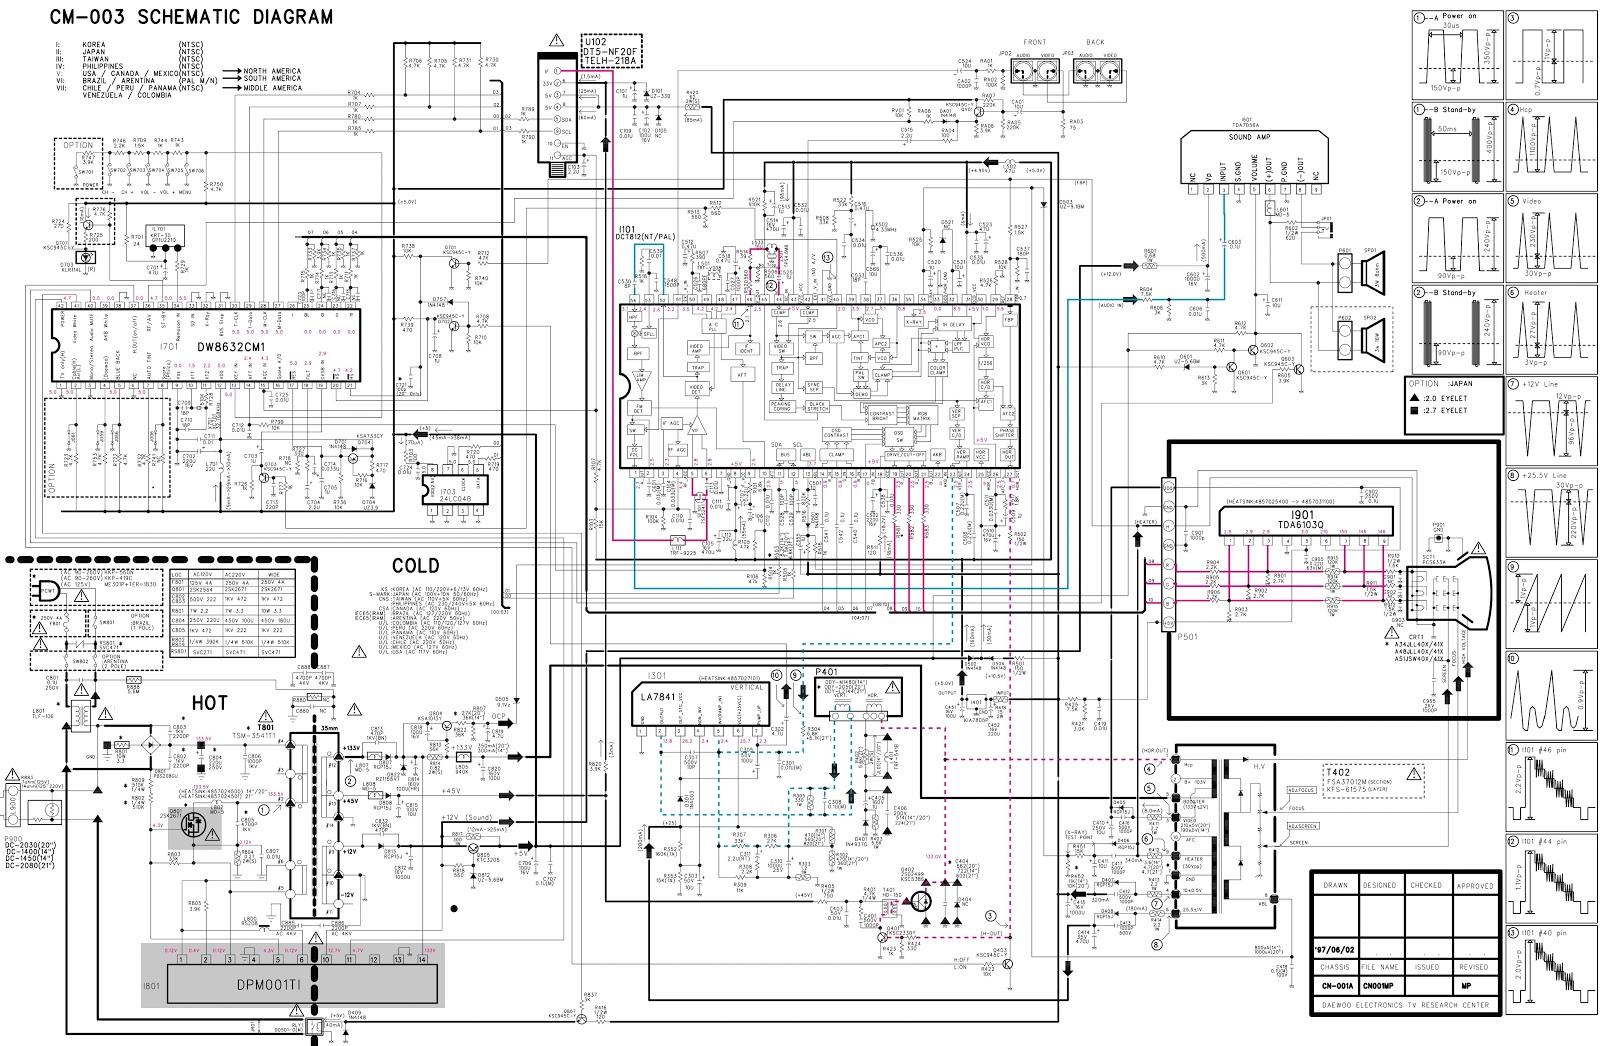 daewoo dth14 dth20 dth21 crt tv [pal ntsc] service mode HDTV USB DVB-T Software dvb t circuit diagram